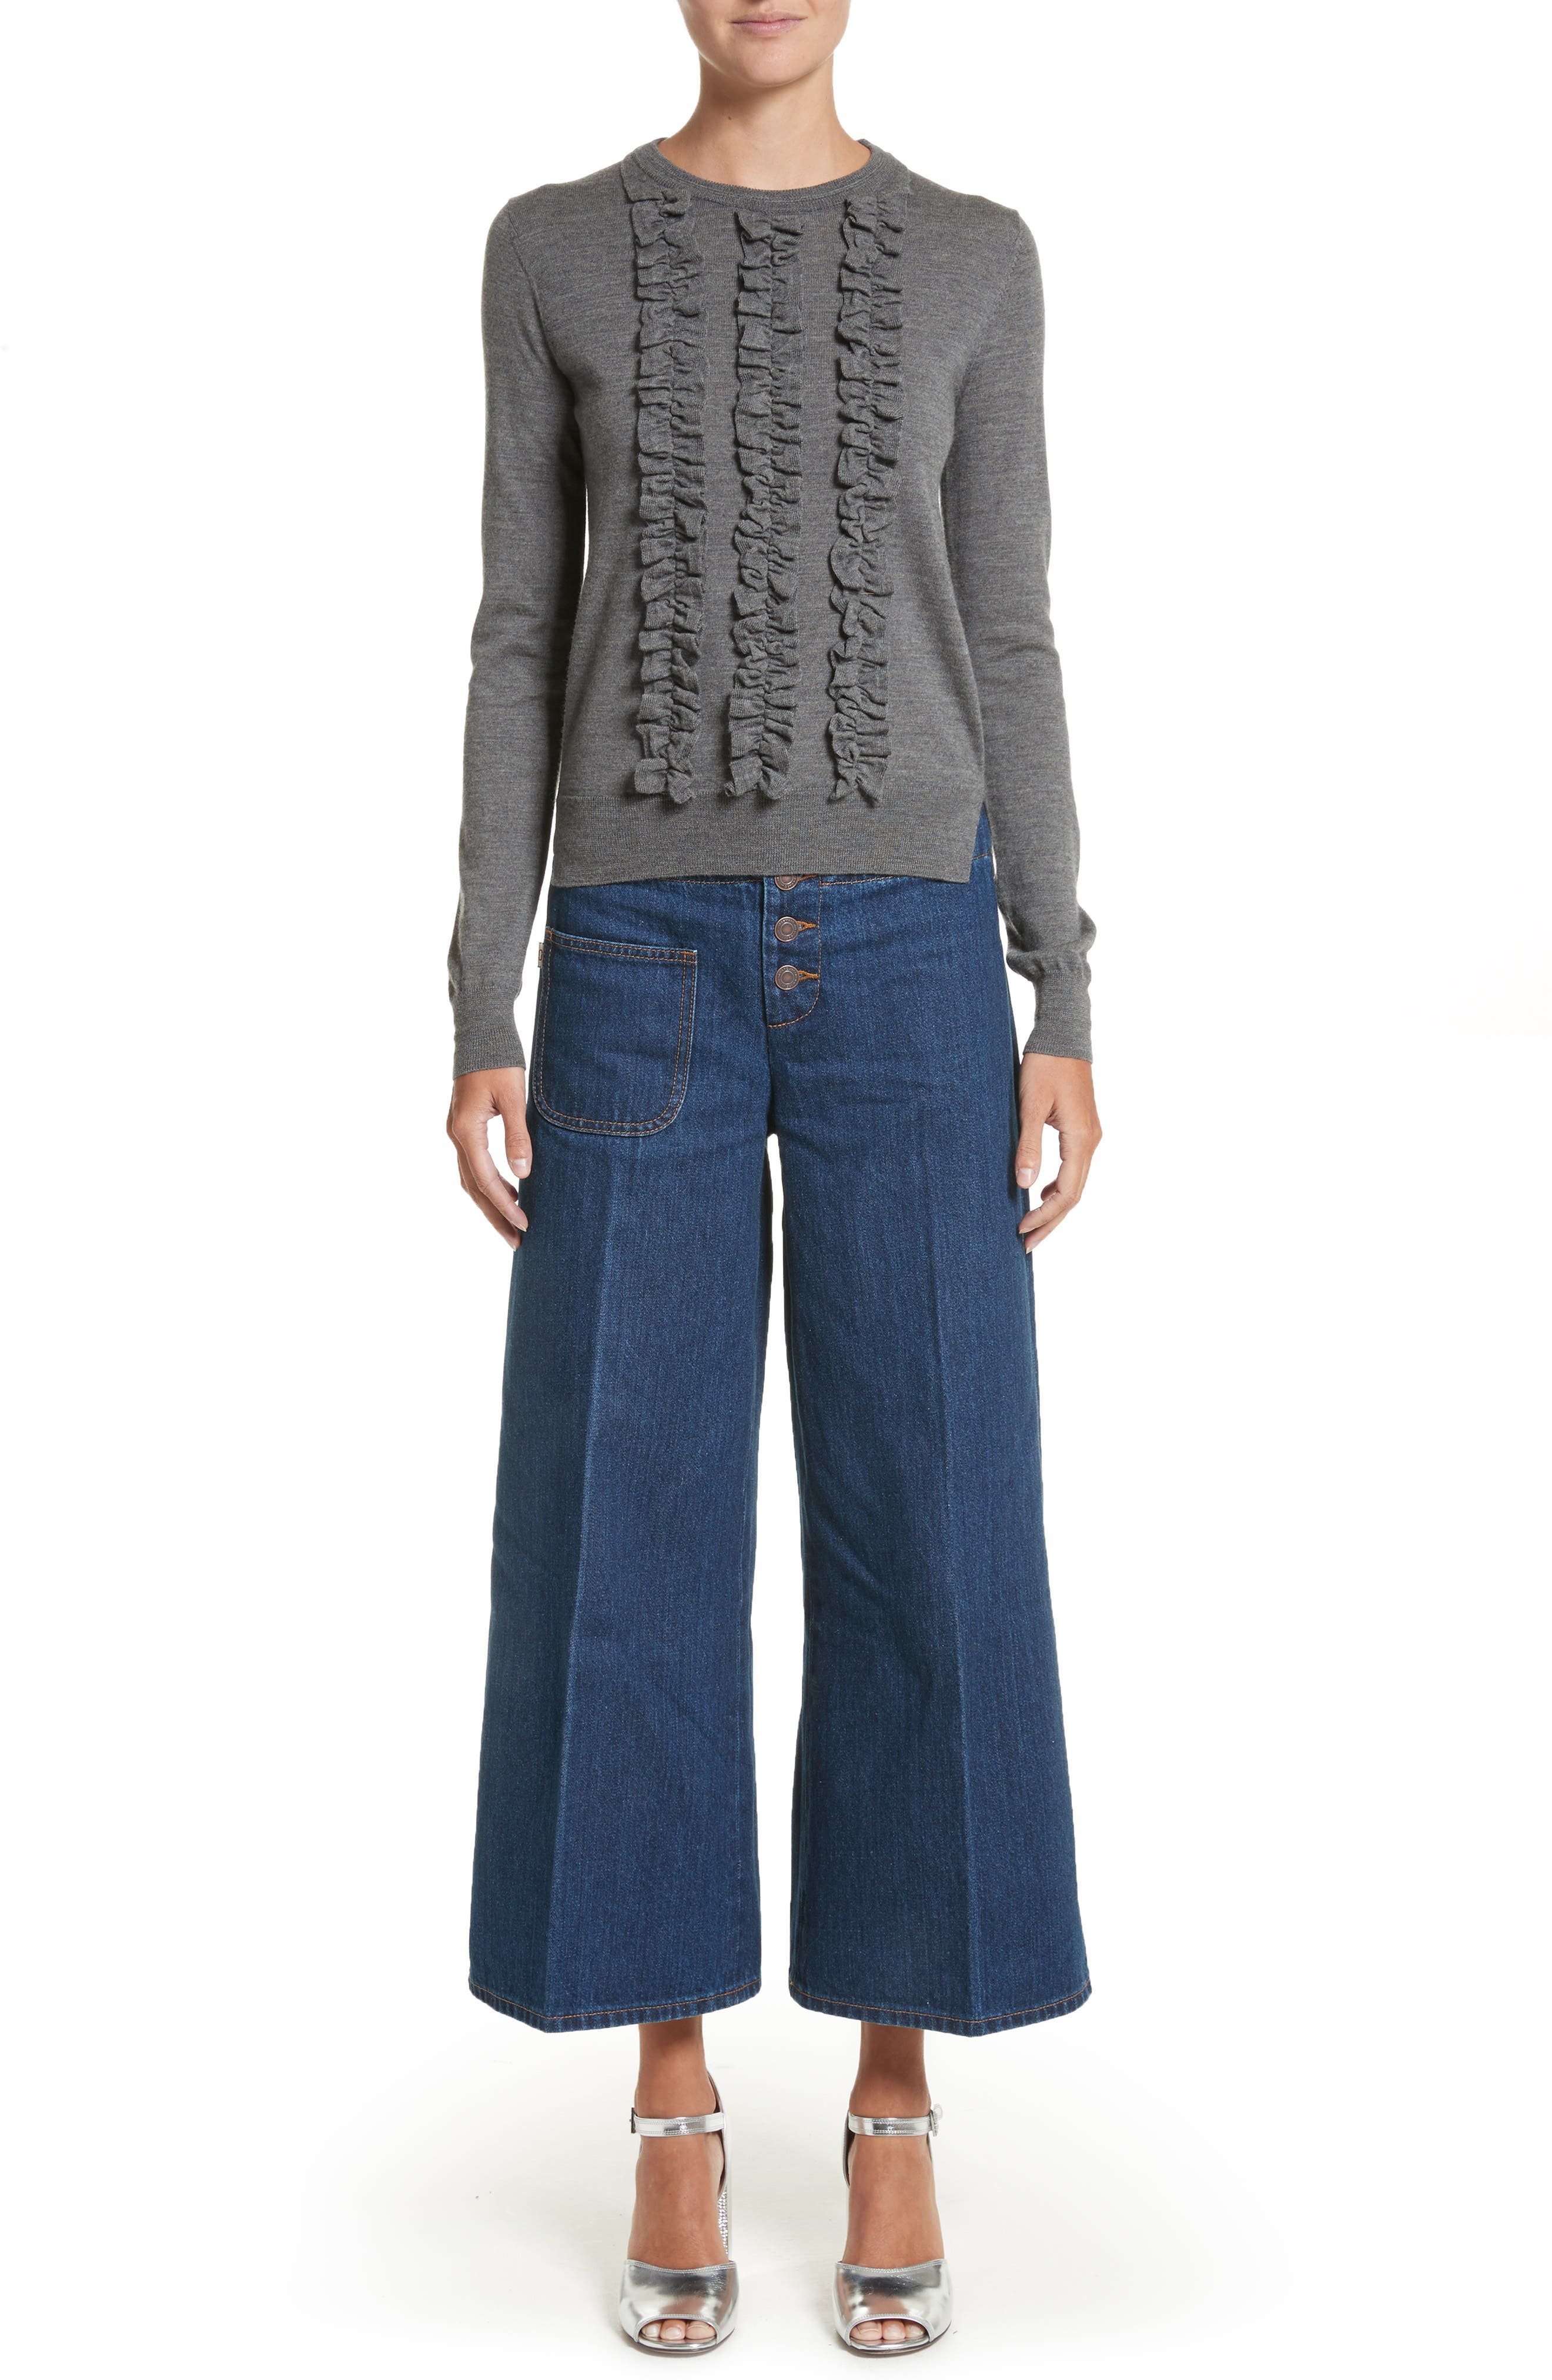 Ruffle Merino Wool Sweater,                             Alternate thumbnail 7, color,                             Dark Grey Melange